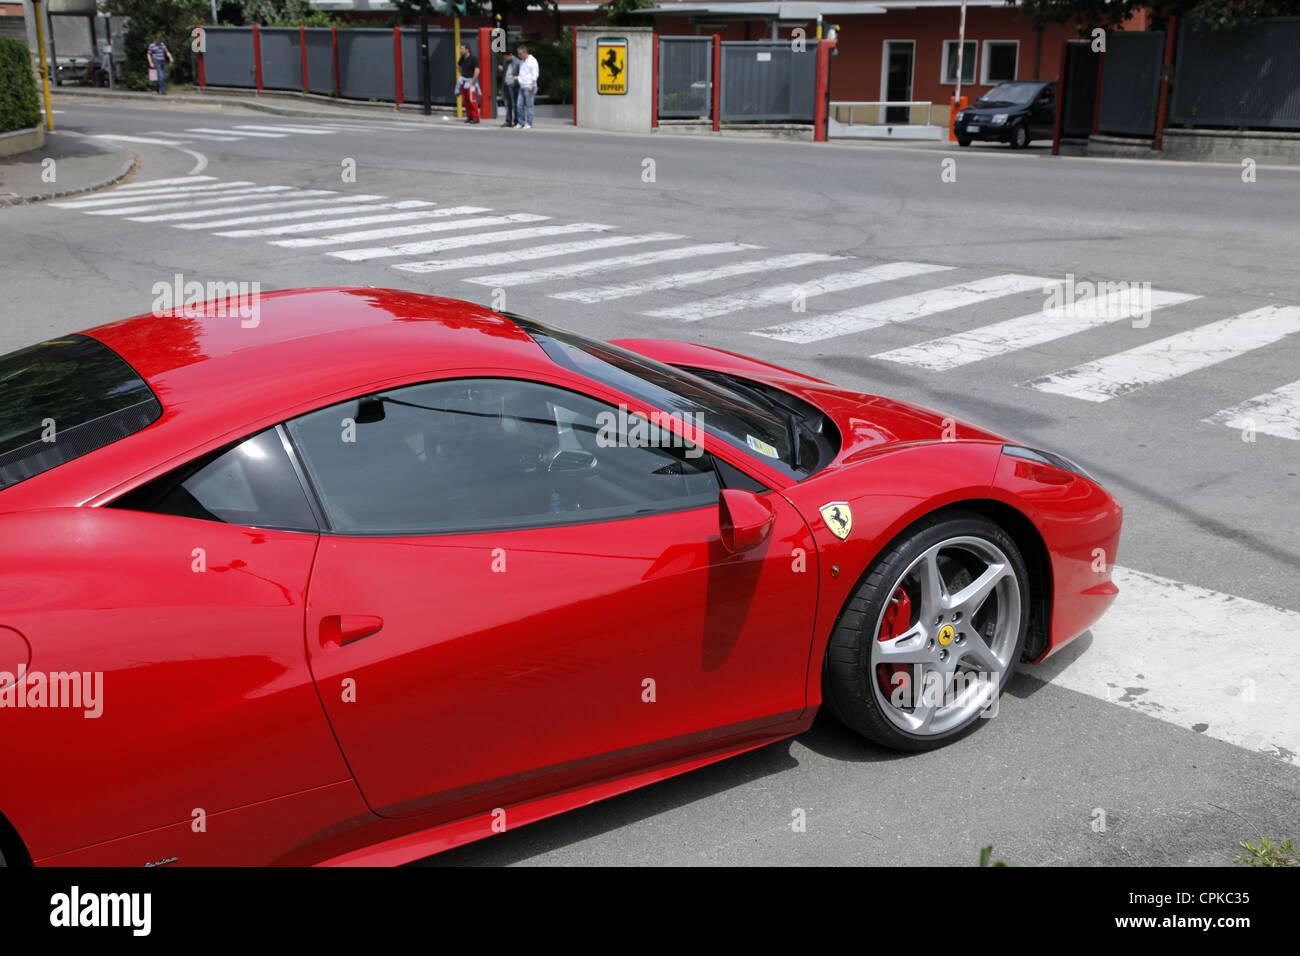 Rouge Ferrari 458 Maranello VOITURE & PORTES D'USINE ITALIE 08 Mai 2012 Photo Stock